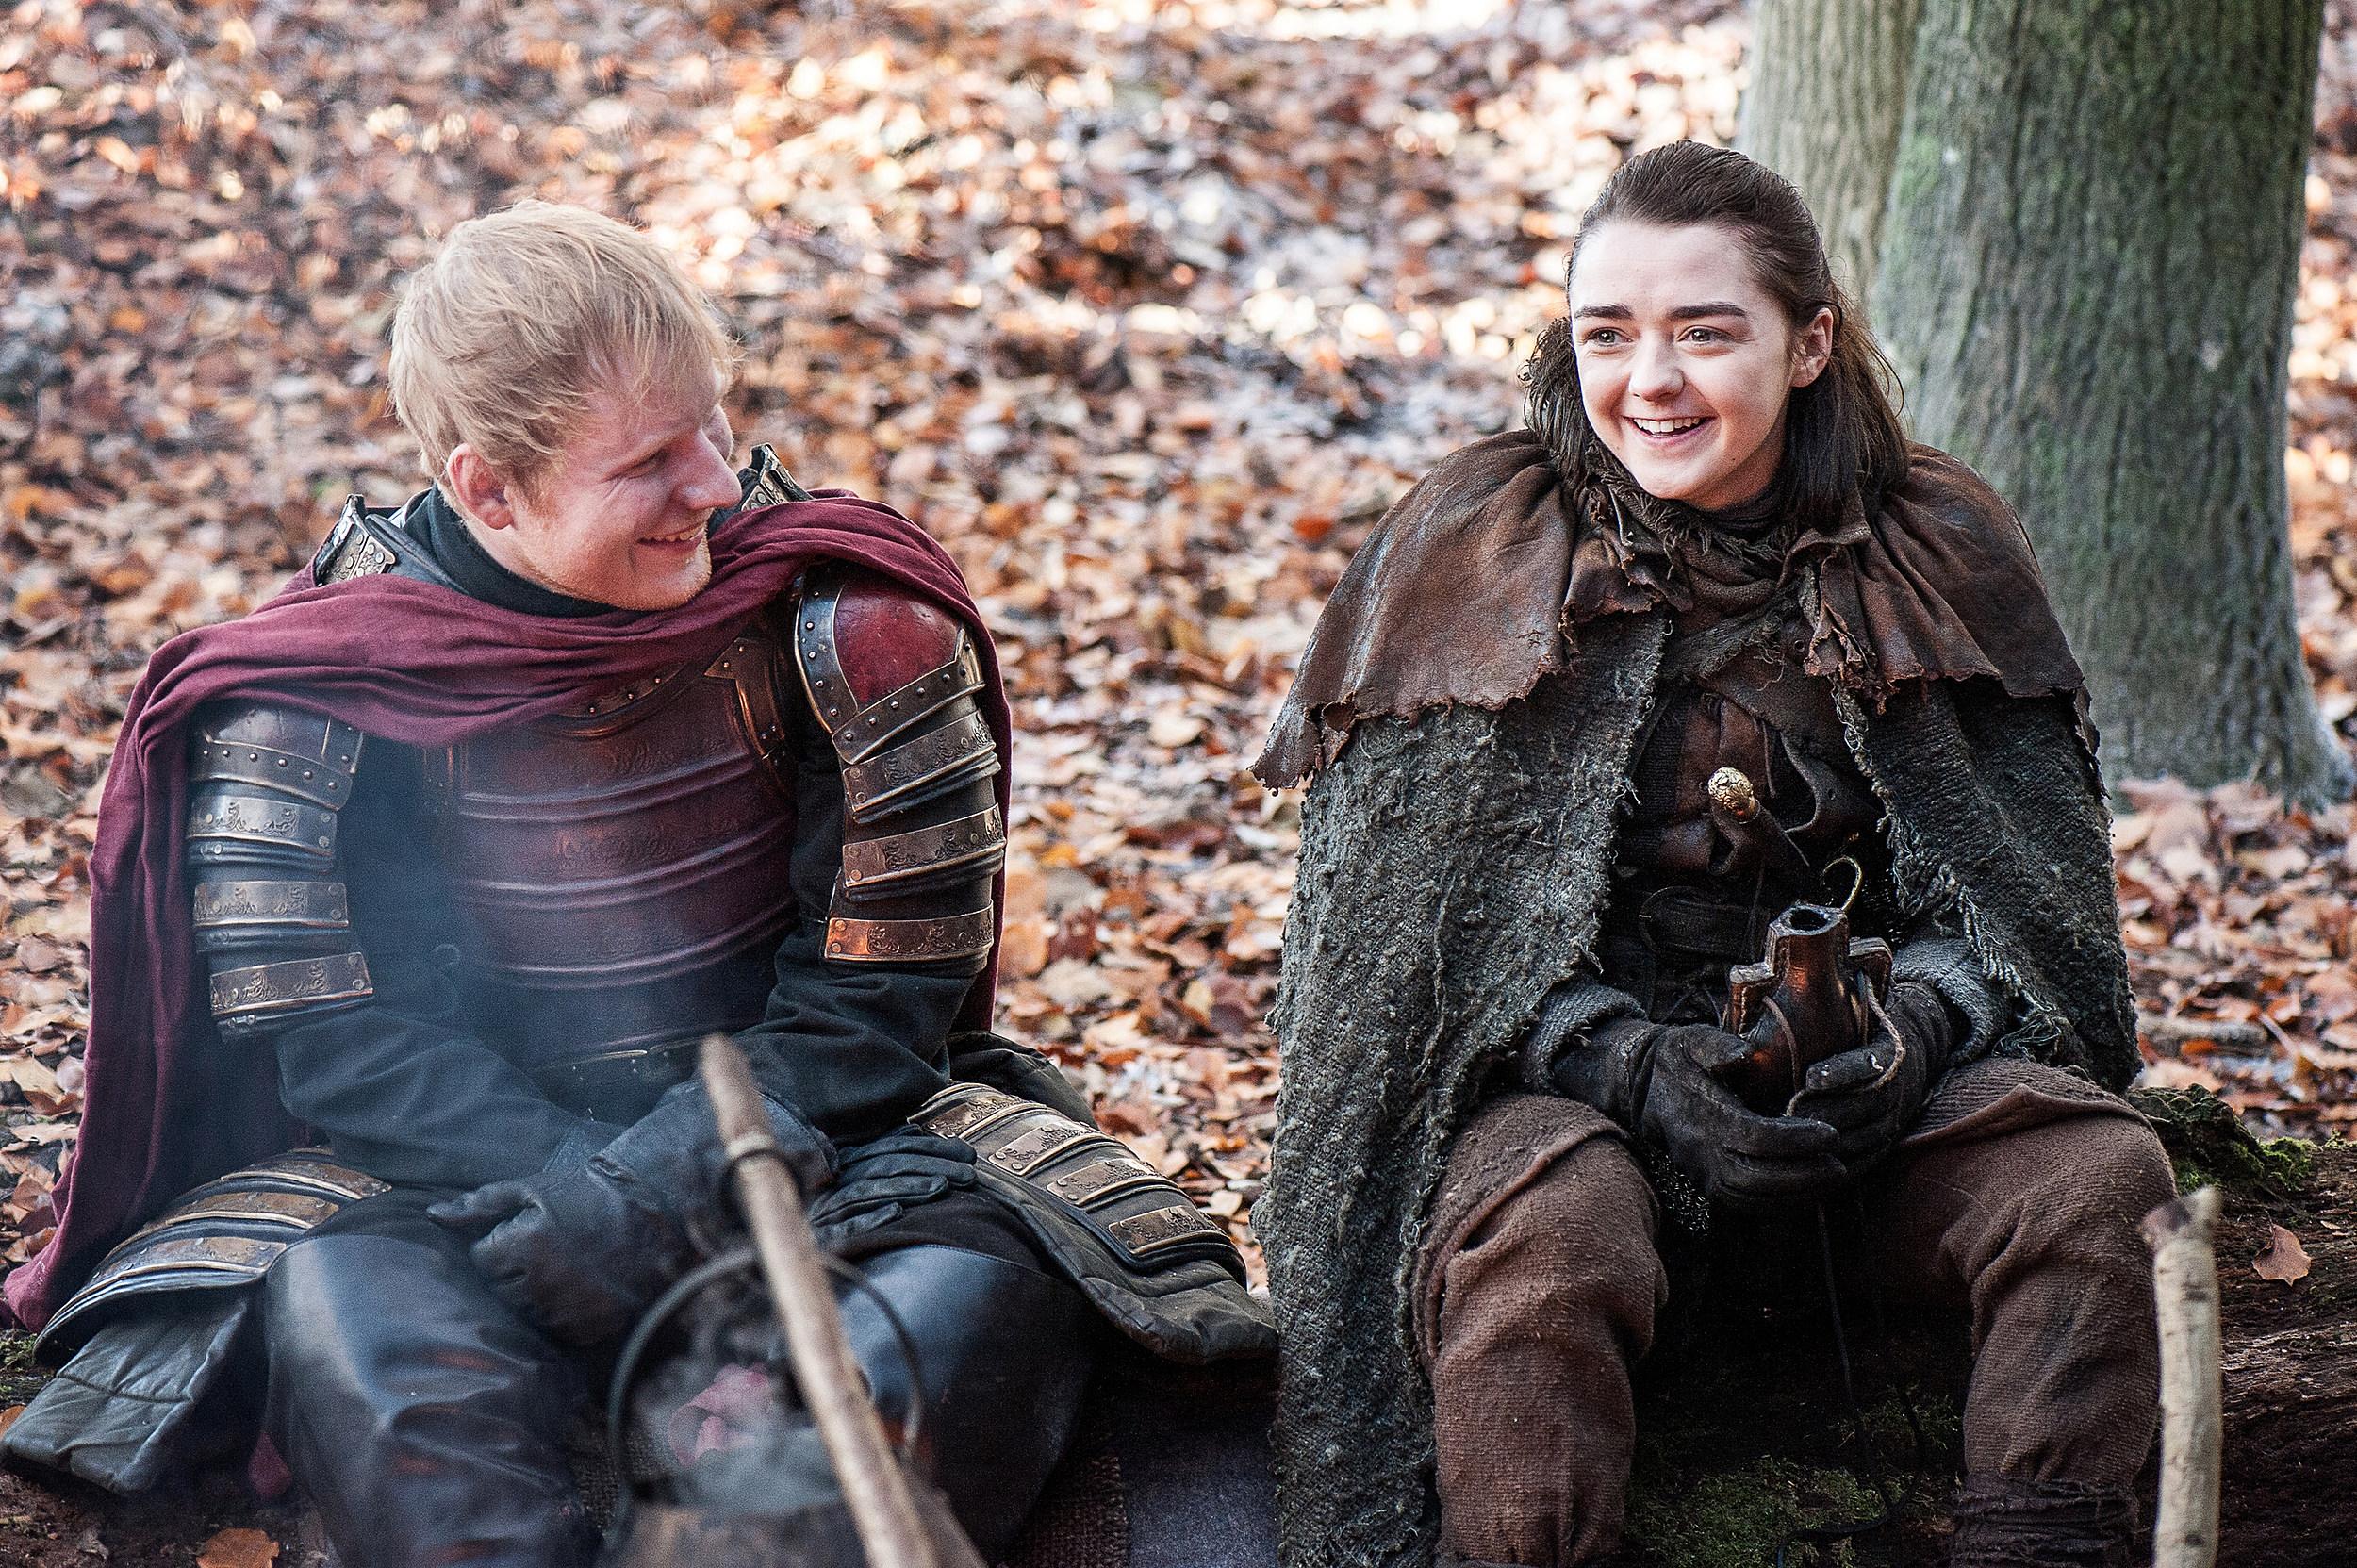 Game of Thrones Season 7 Premiere Ed Sheeran